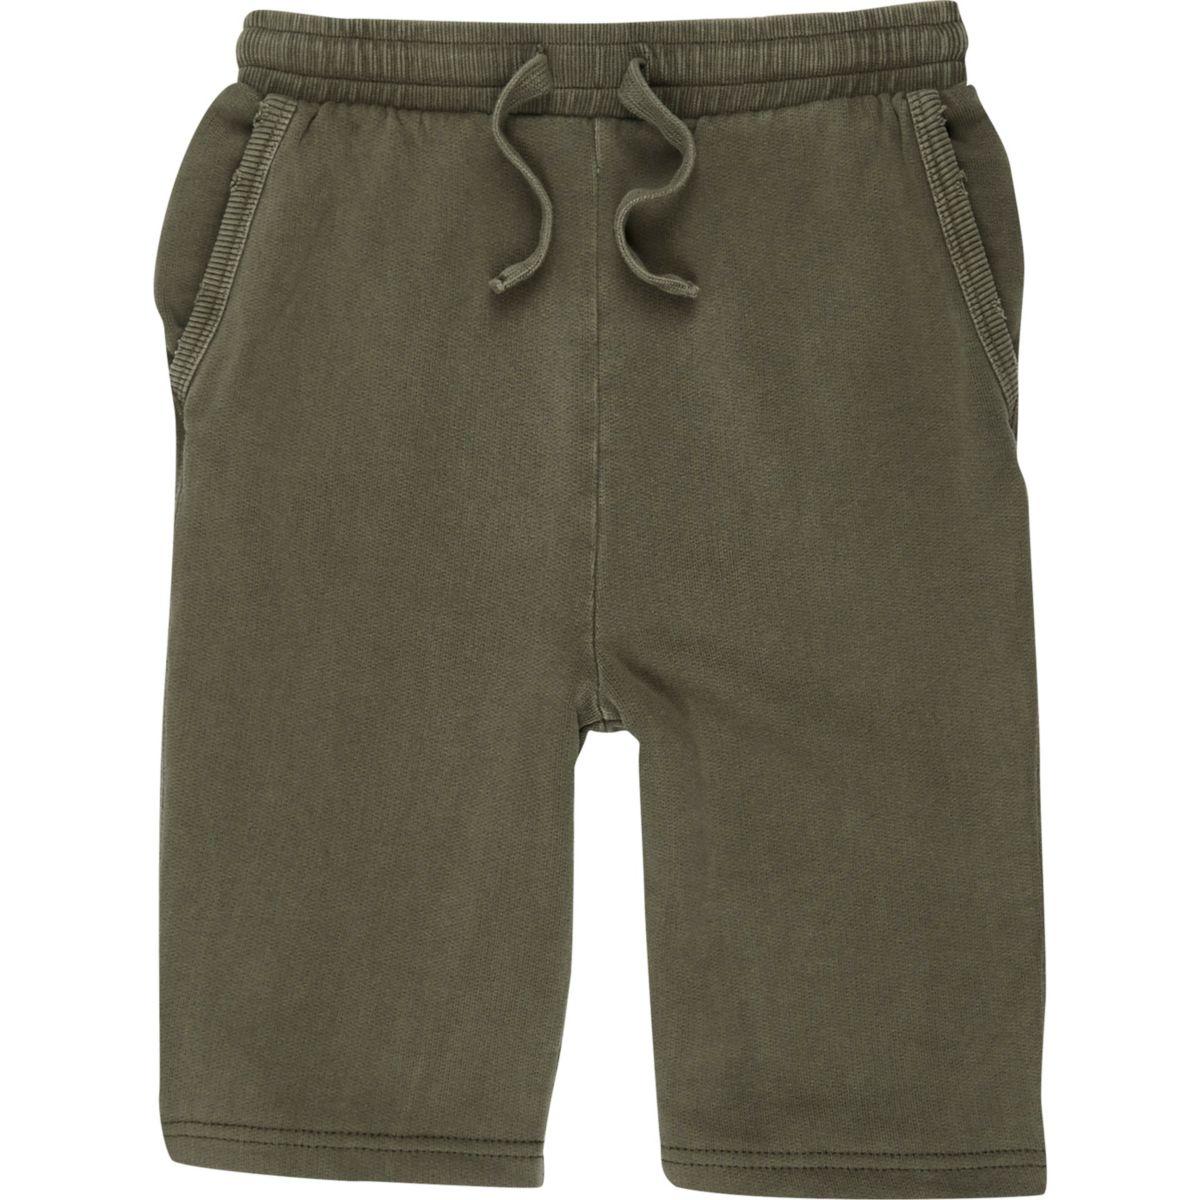 Boys khaki green jersey shorts